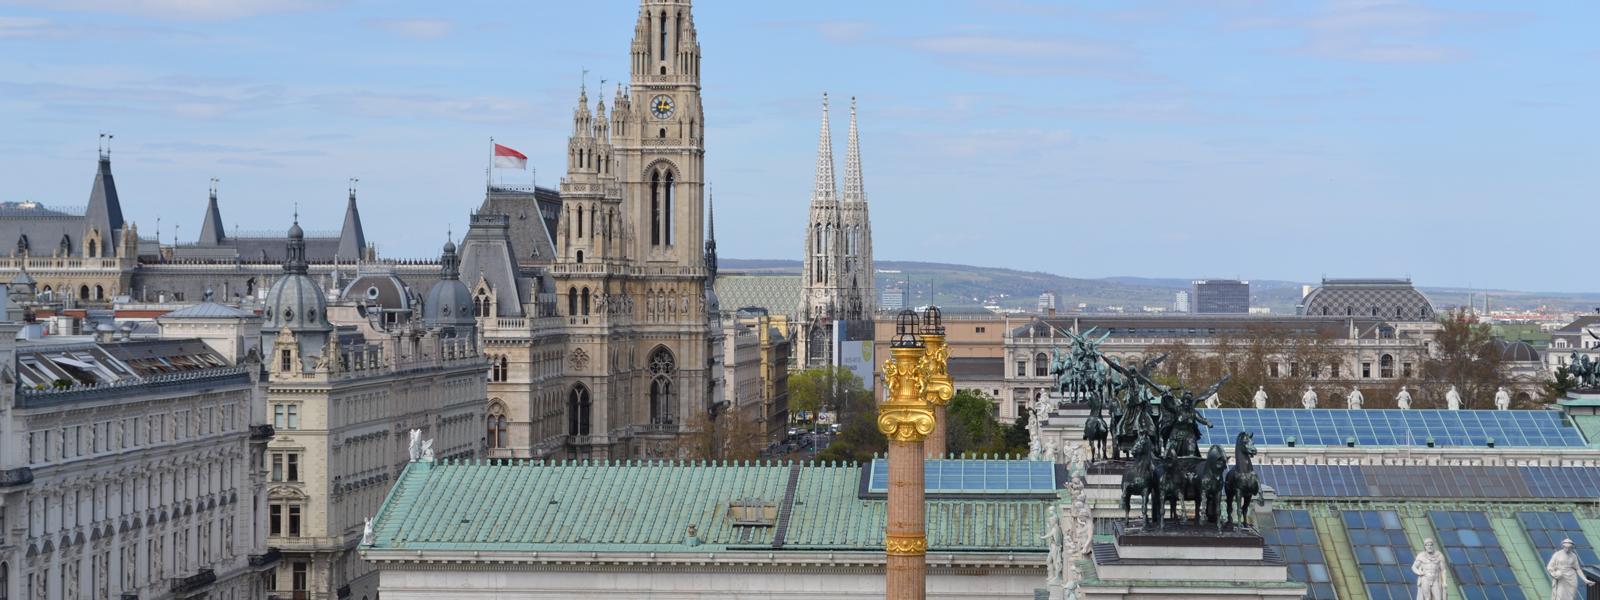 Foto: Blick Richtung Wiener Rathaus